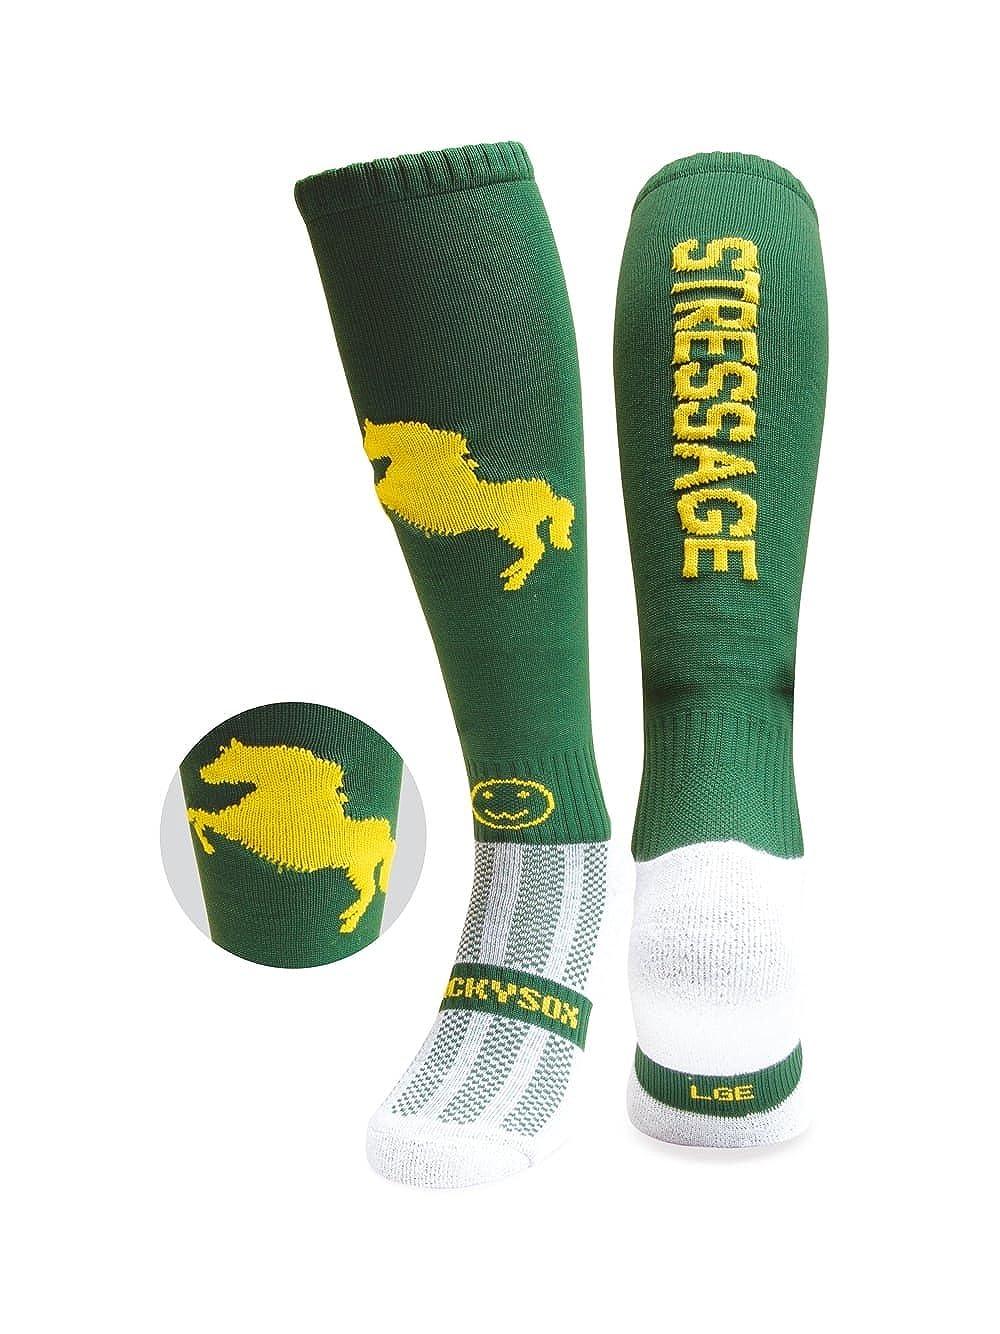 WackySox Spaced Out Astronut Sports Socks